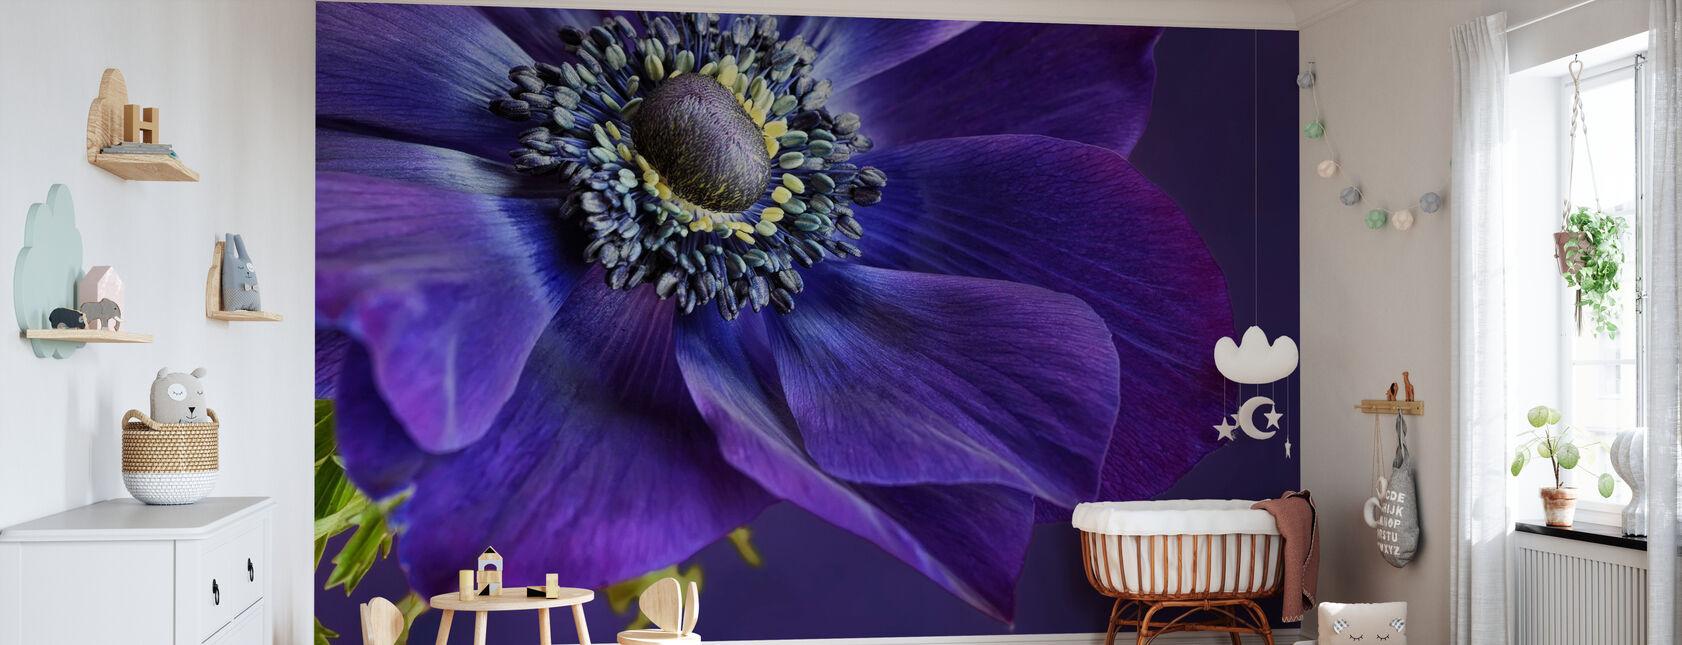 Indigo Anemone - Wallpaper - Nursery